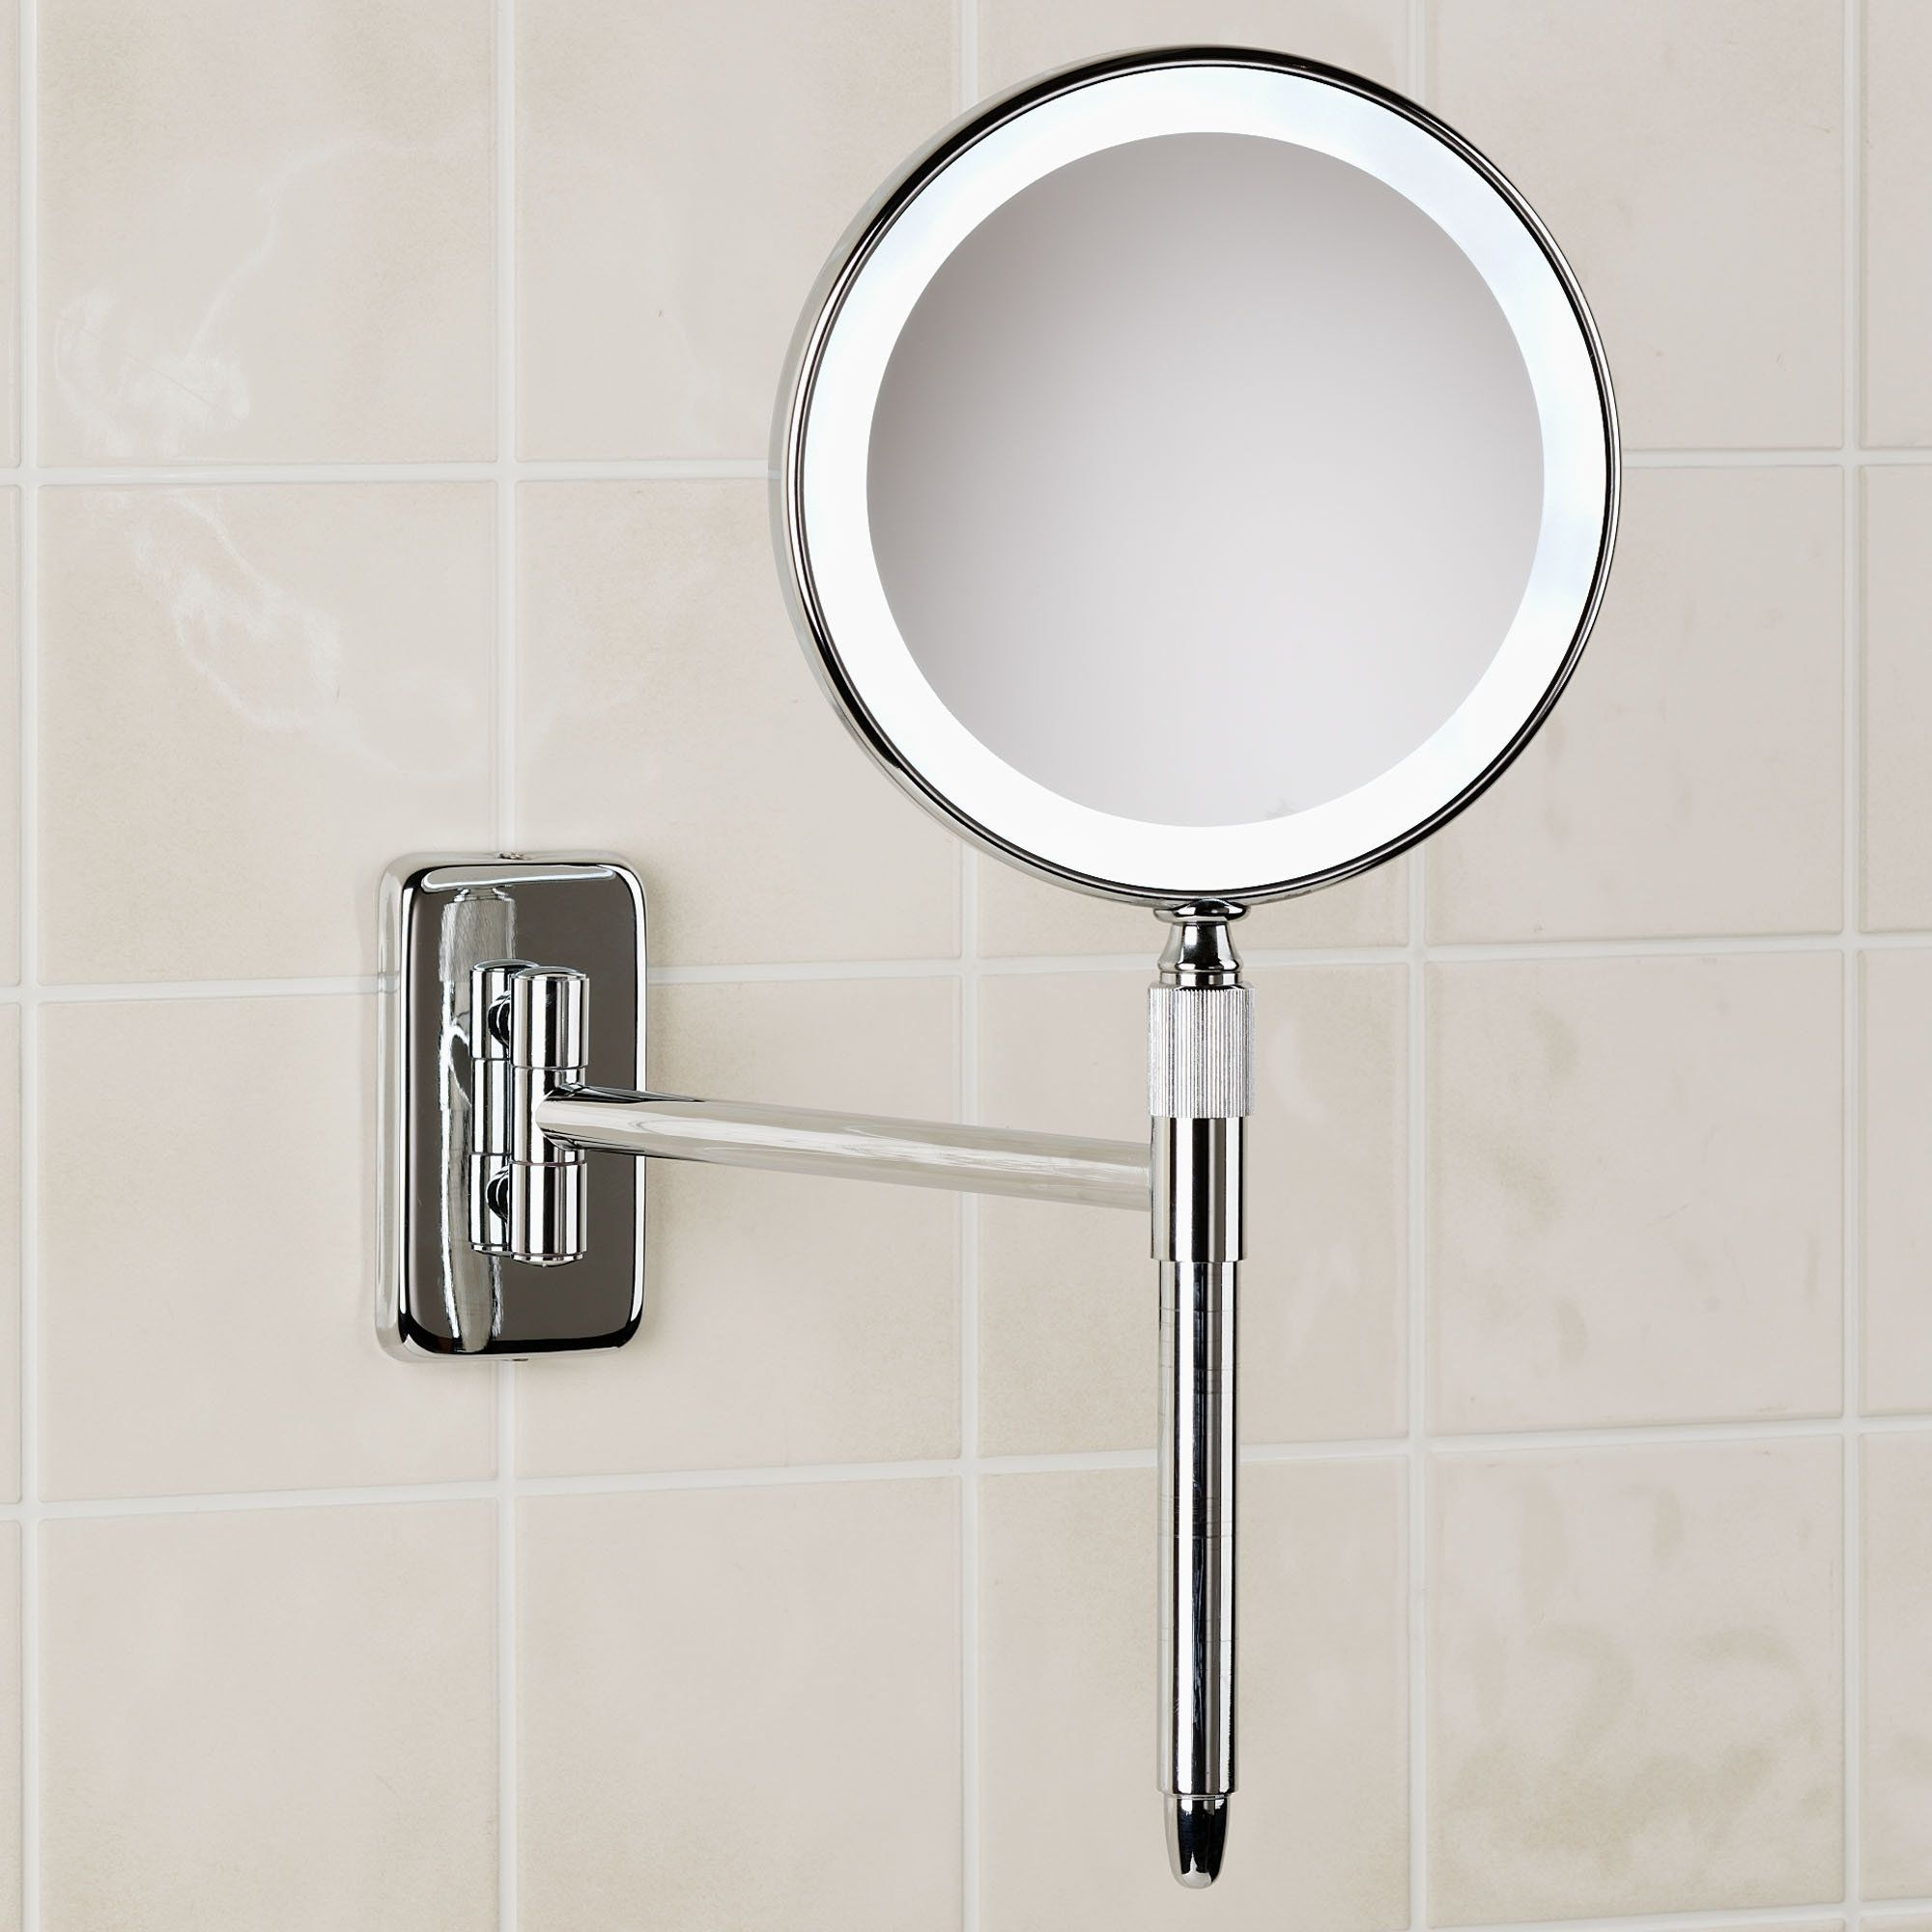 Wall Mounted Vanity Mirror Chrome